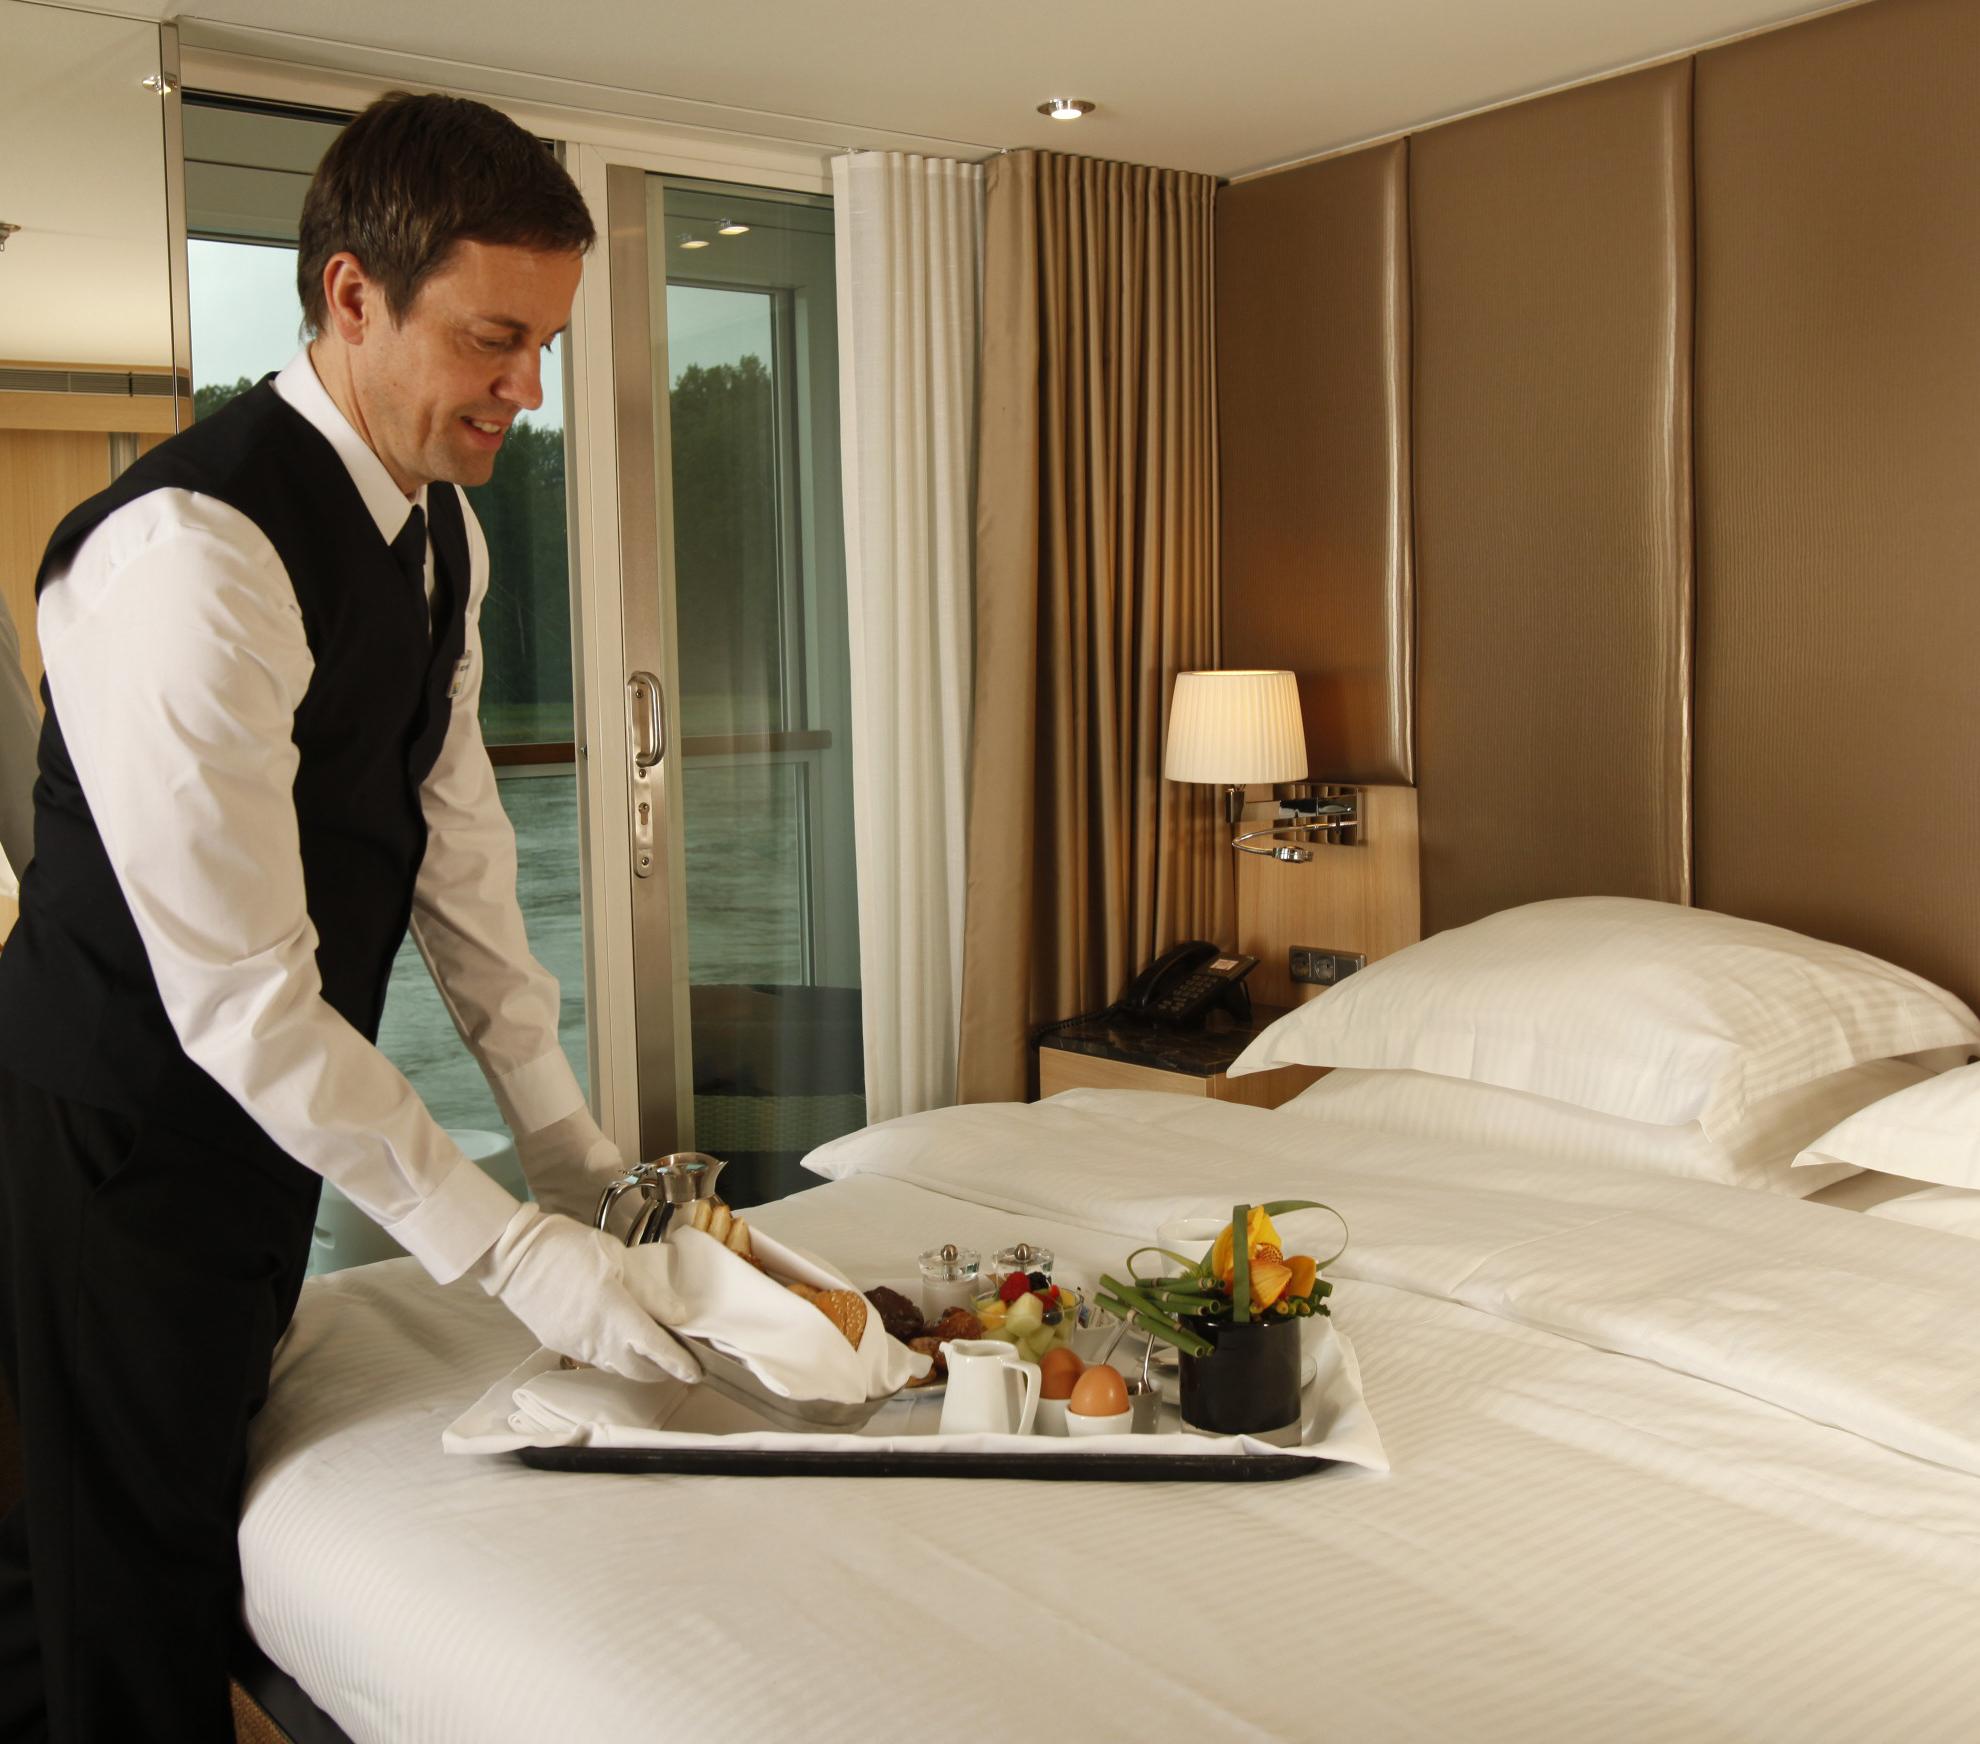 Scenic Jasper Room Service Dining _MG_9741r.jpg